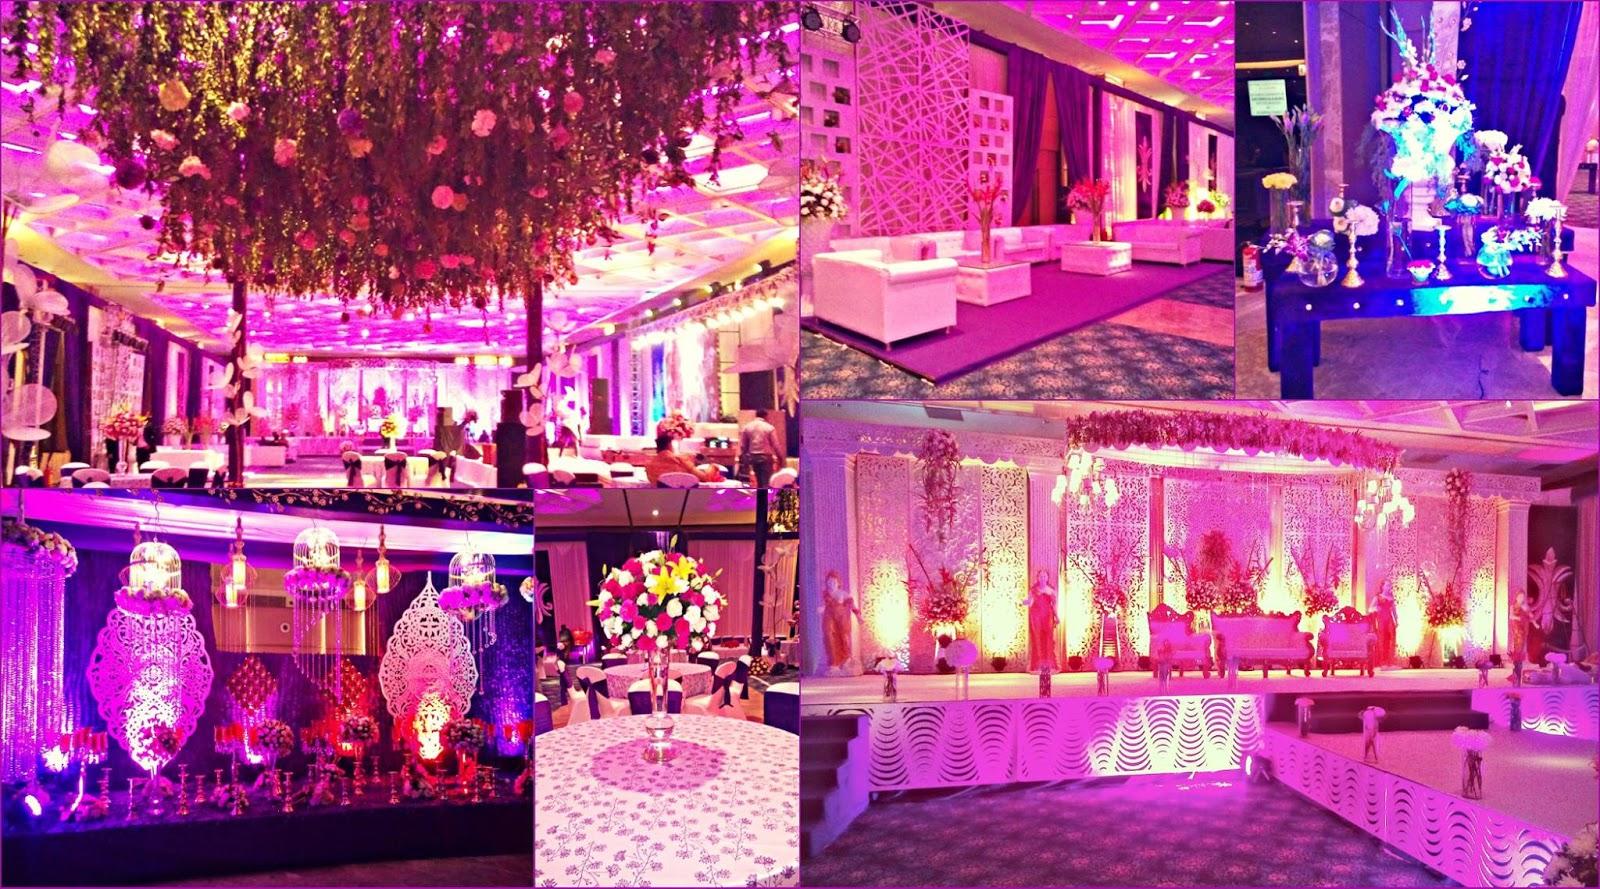 Wedding Planners In Noida Marriage Banquet Hall In Noida Delhi NCR Birthday Party Planner